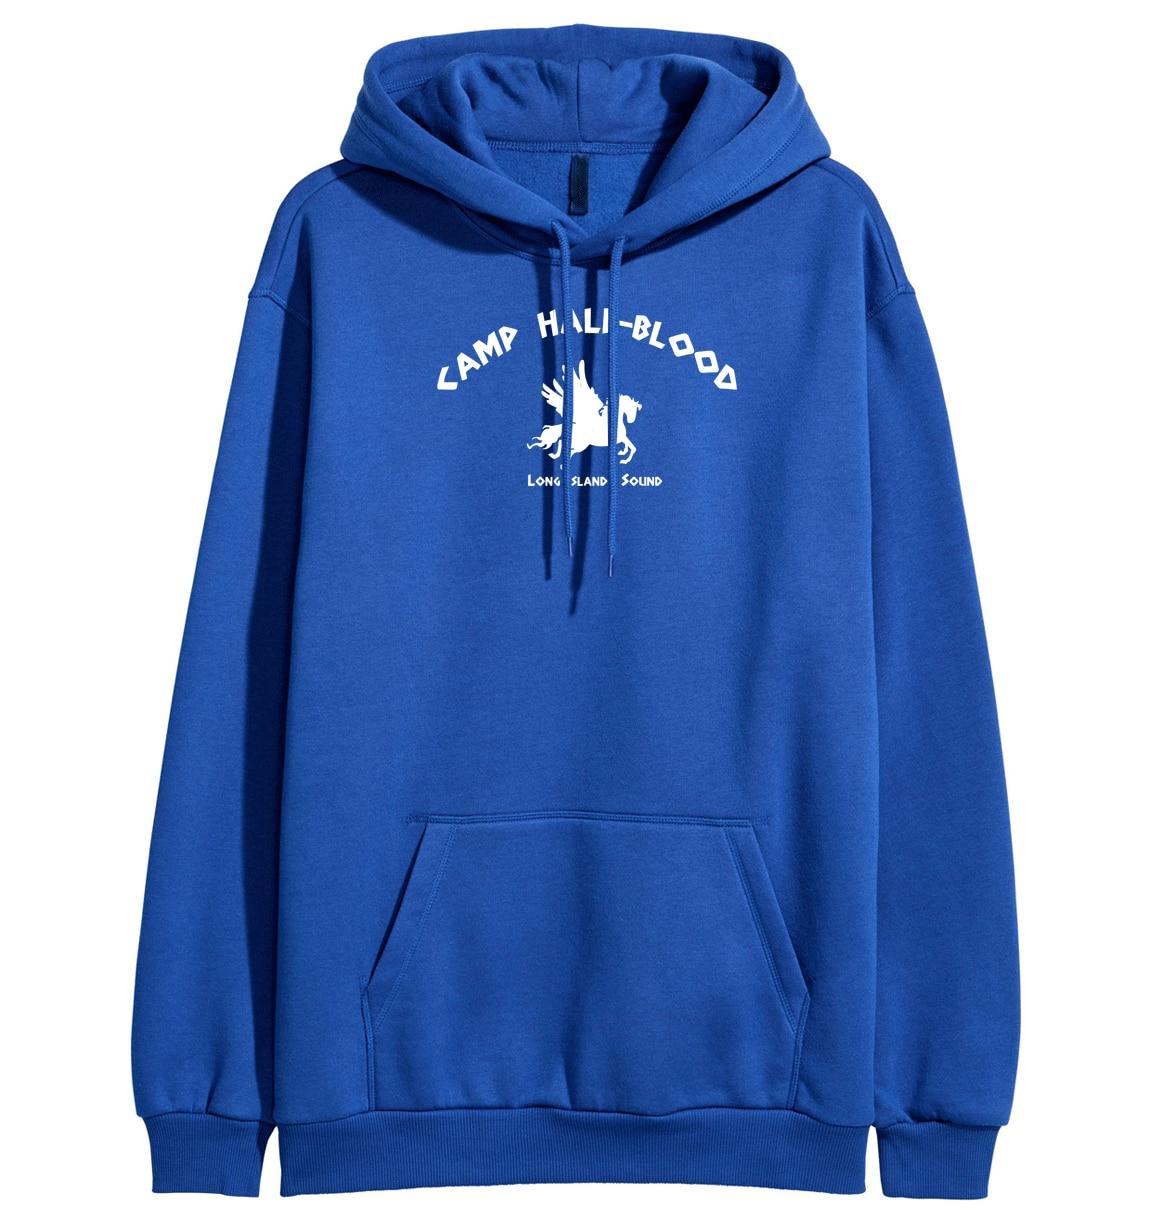 Fashion Sweatshirts 2019 Spring Winter Fleece Hoodies Print Camp Half Blood Demigods Unicorn Kawaii Women's Hoody Pullover Kpop